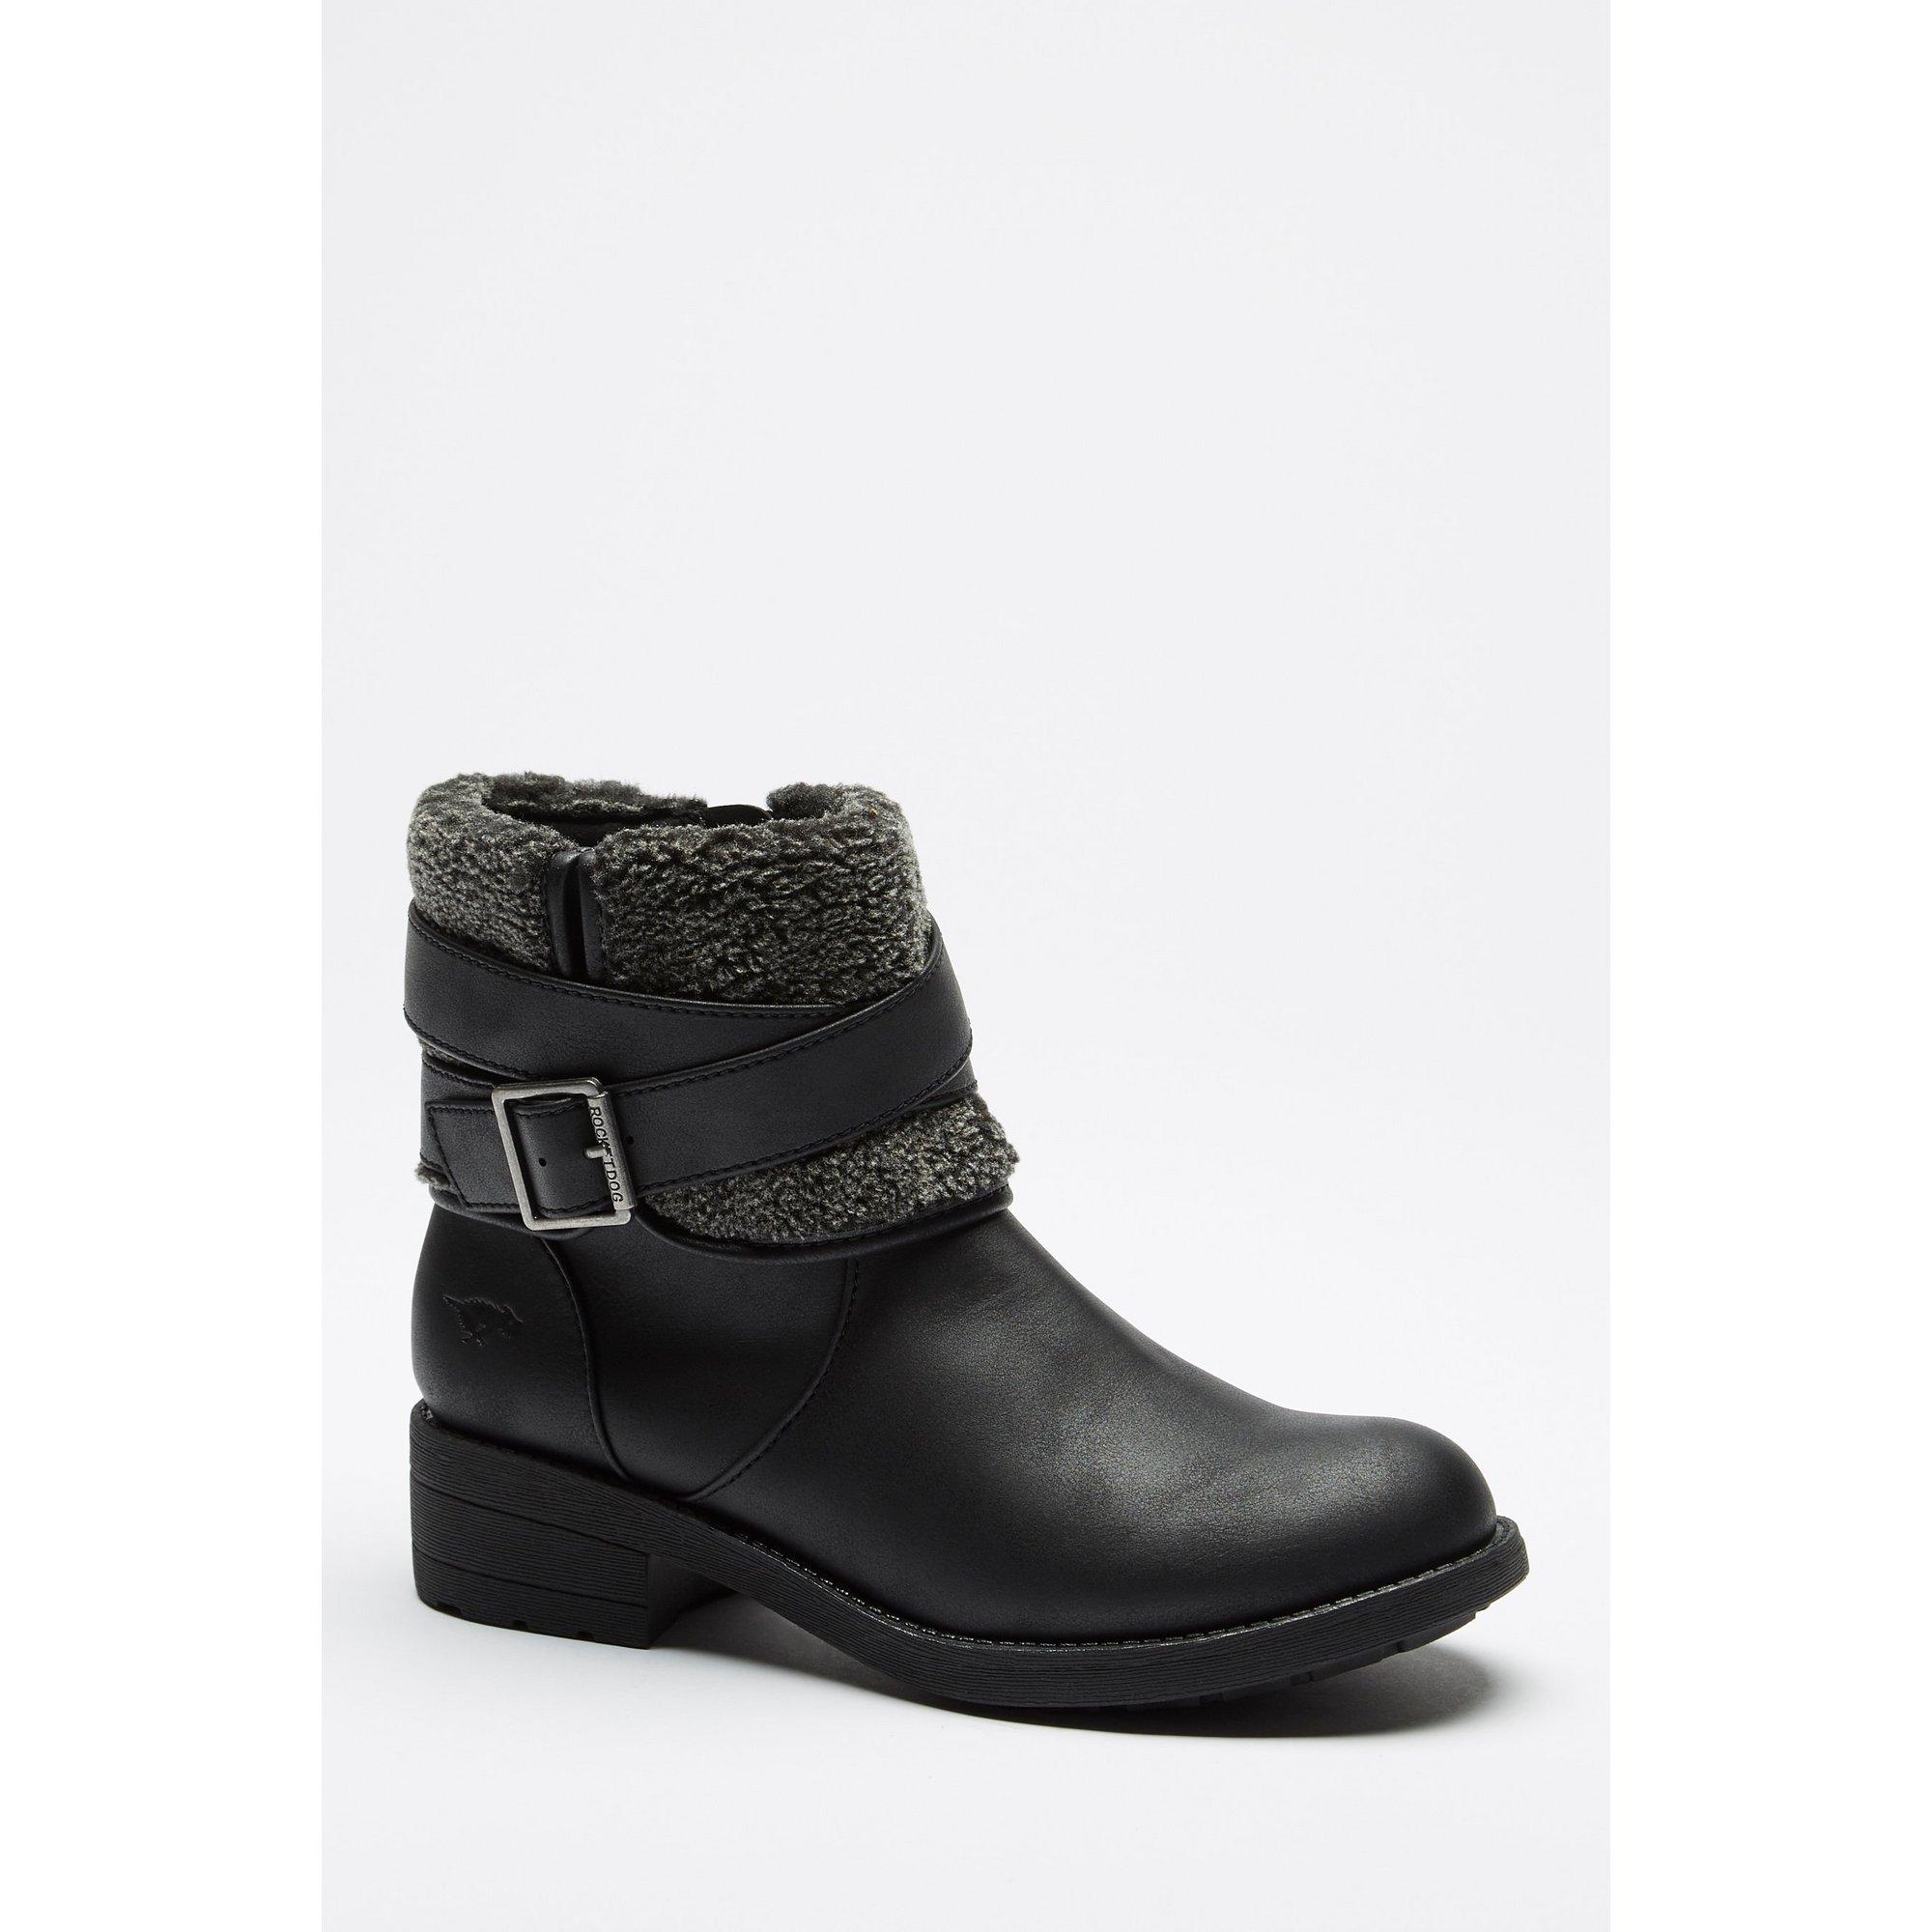 Rocket Dog Trepp Knitted Black Ankle Boots